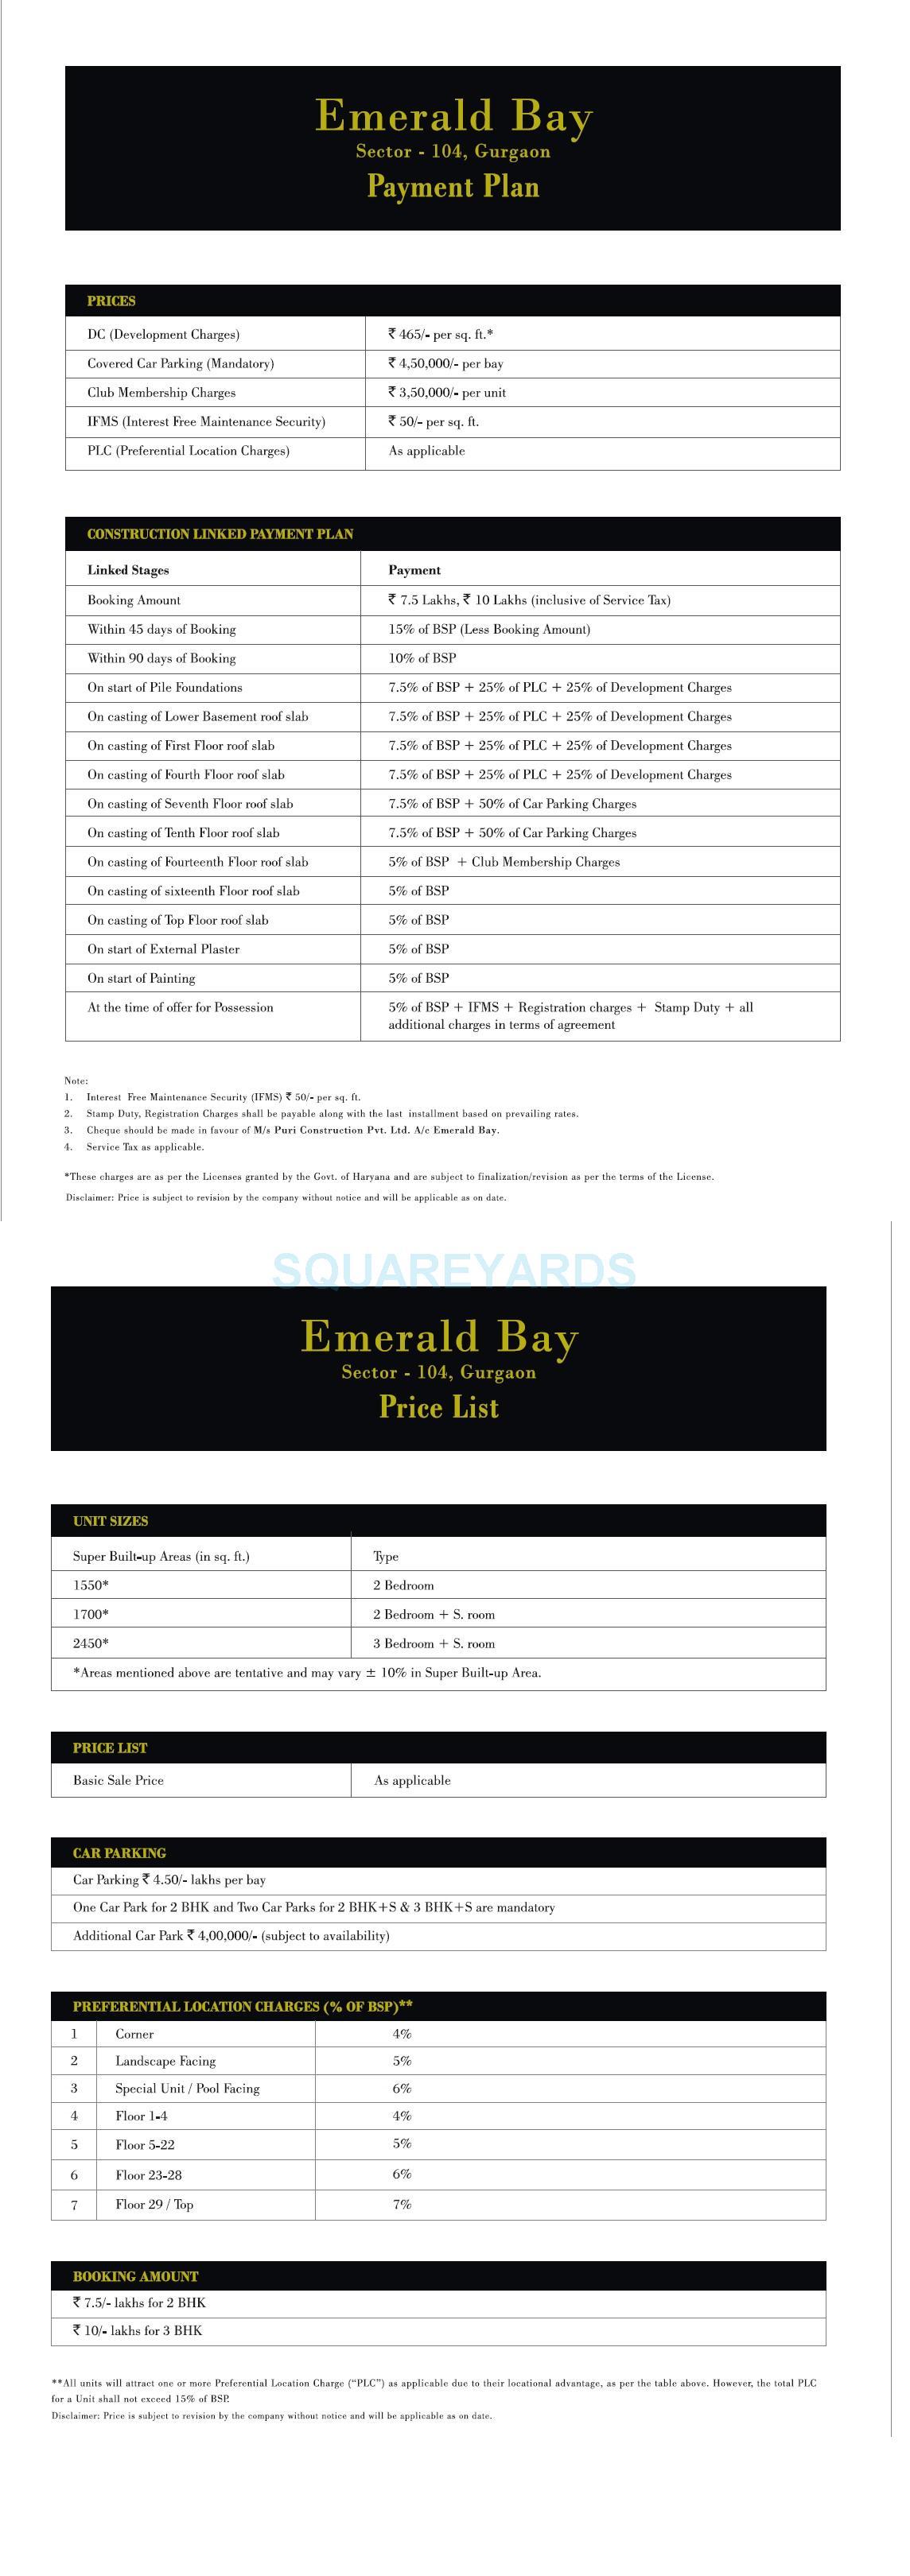 puri emerald bay payment plan image1